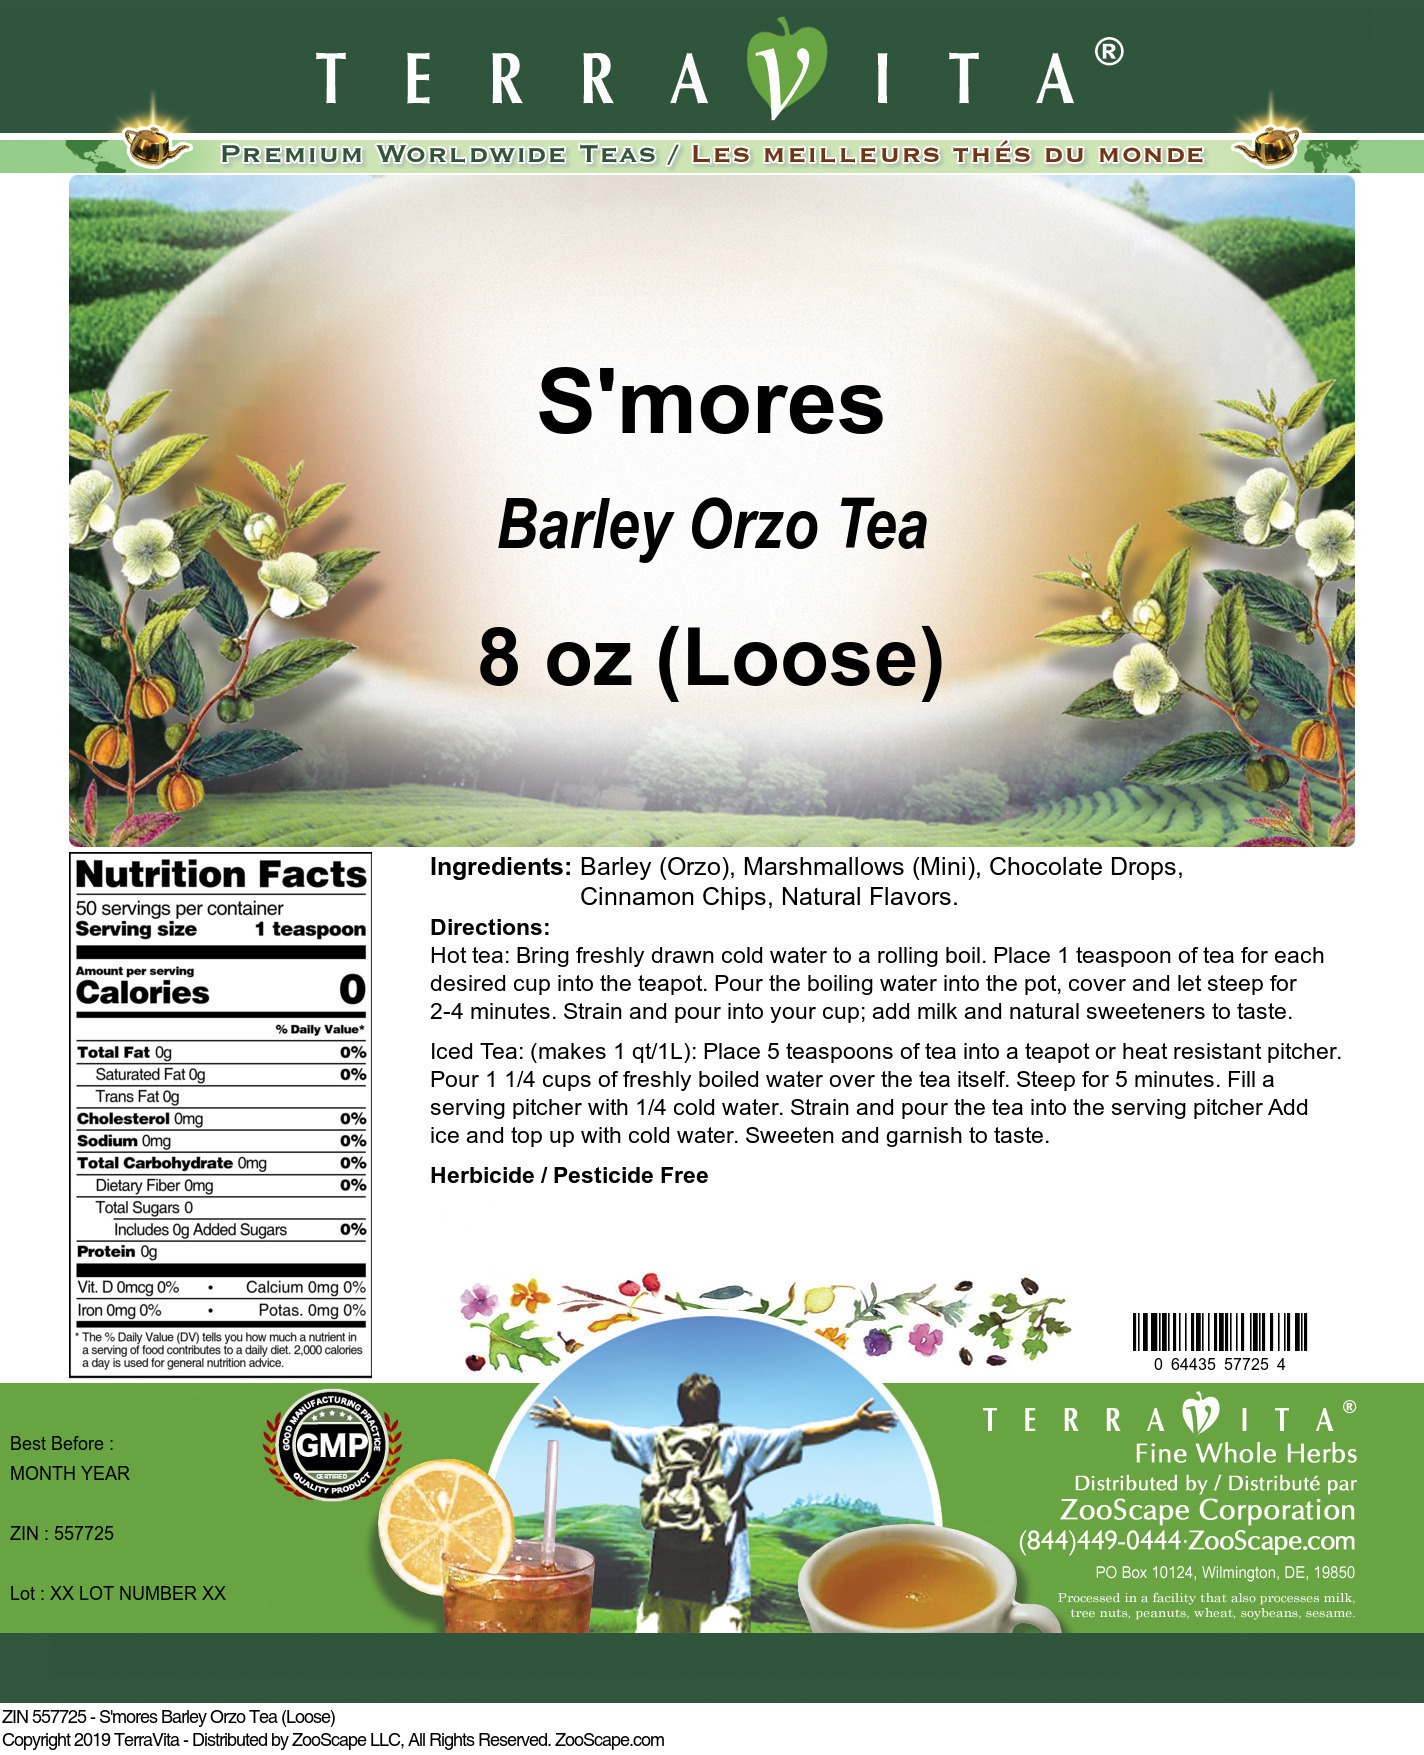 S'mores Barley Orzo Tea (Loose)